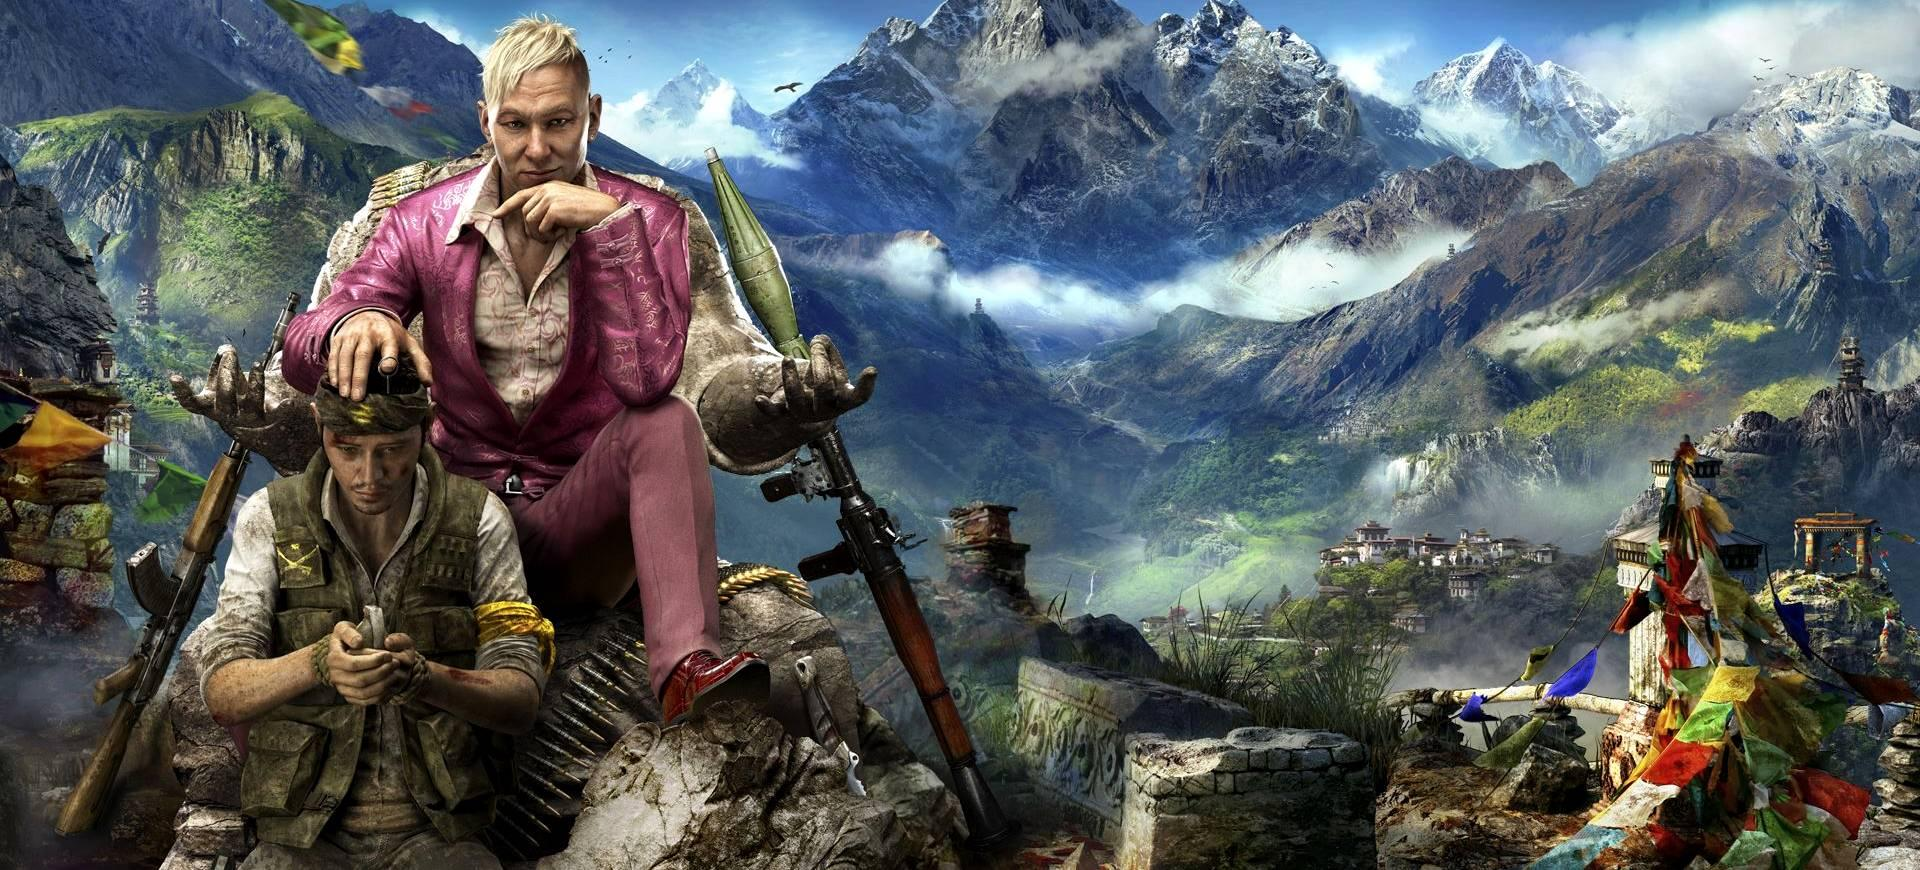 Far Cry 4 - Đánh Giá Game